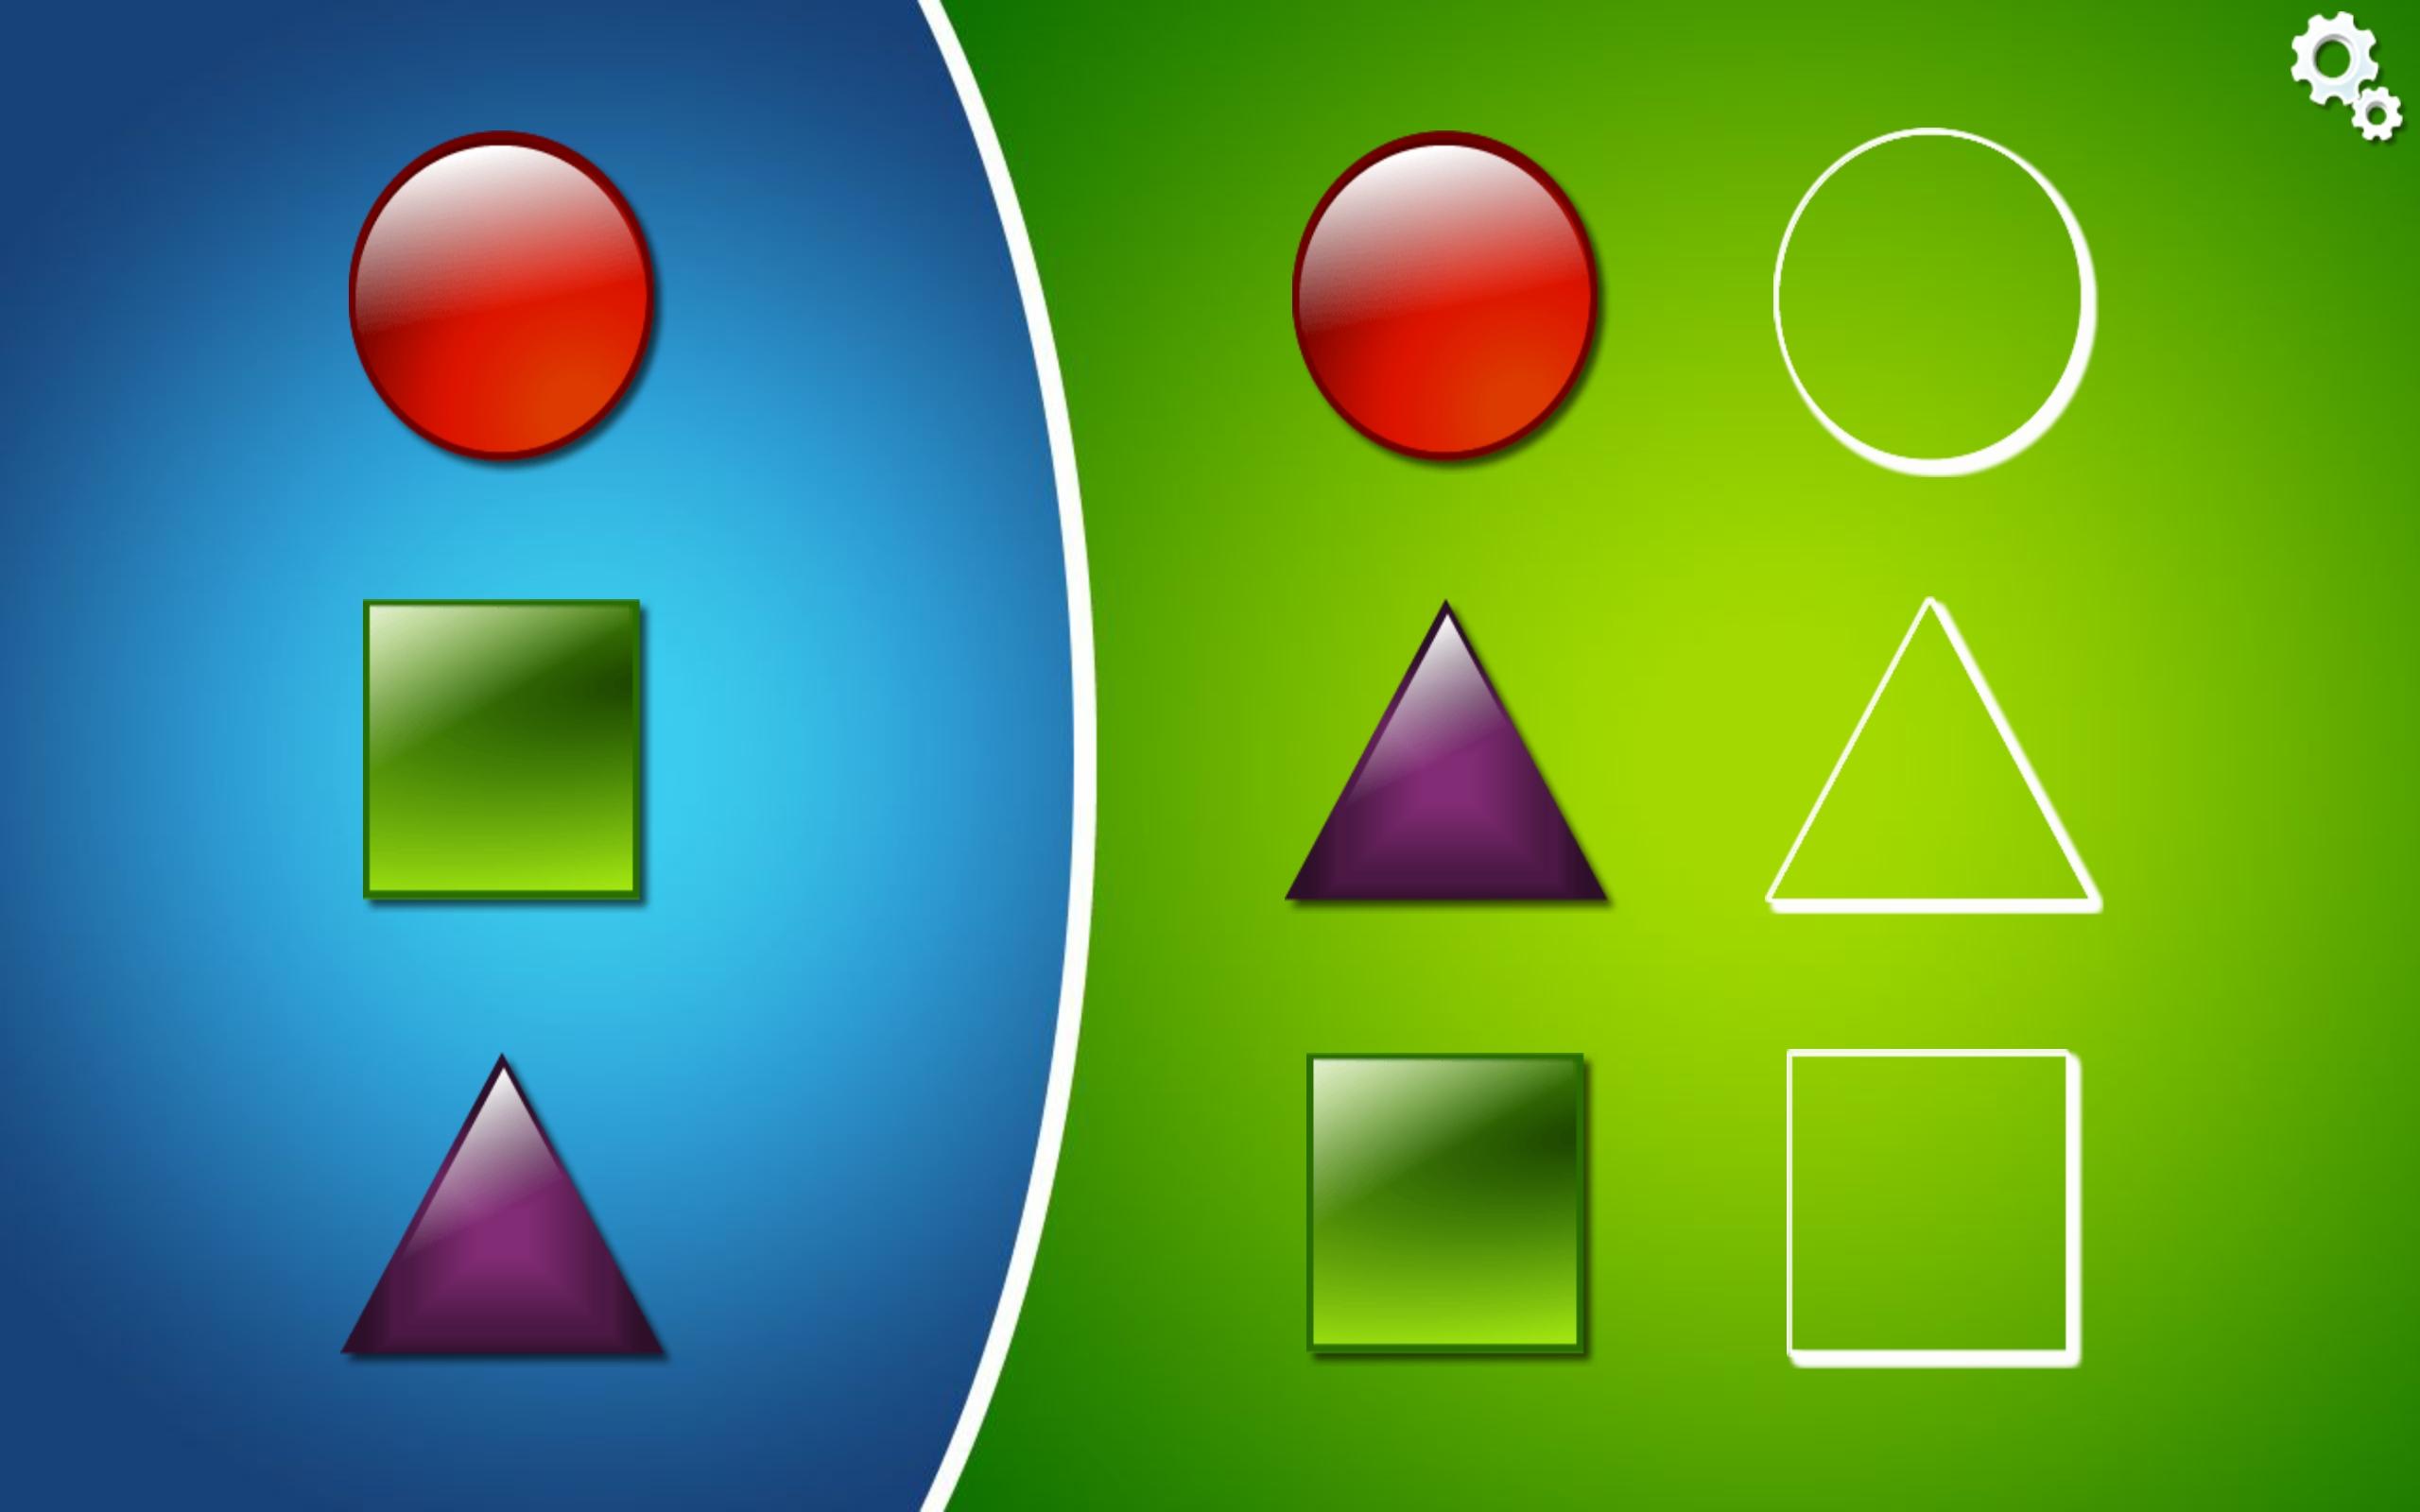 Asociar formas geométricas